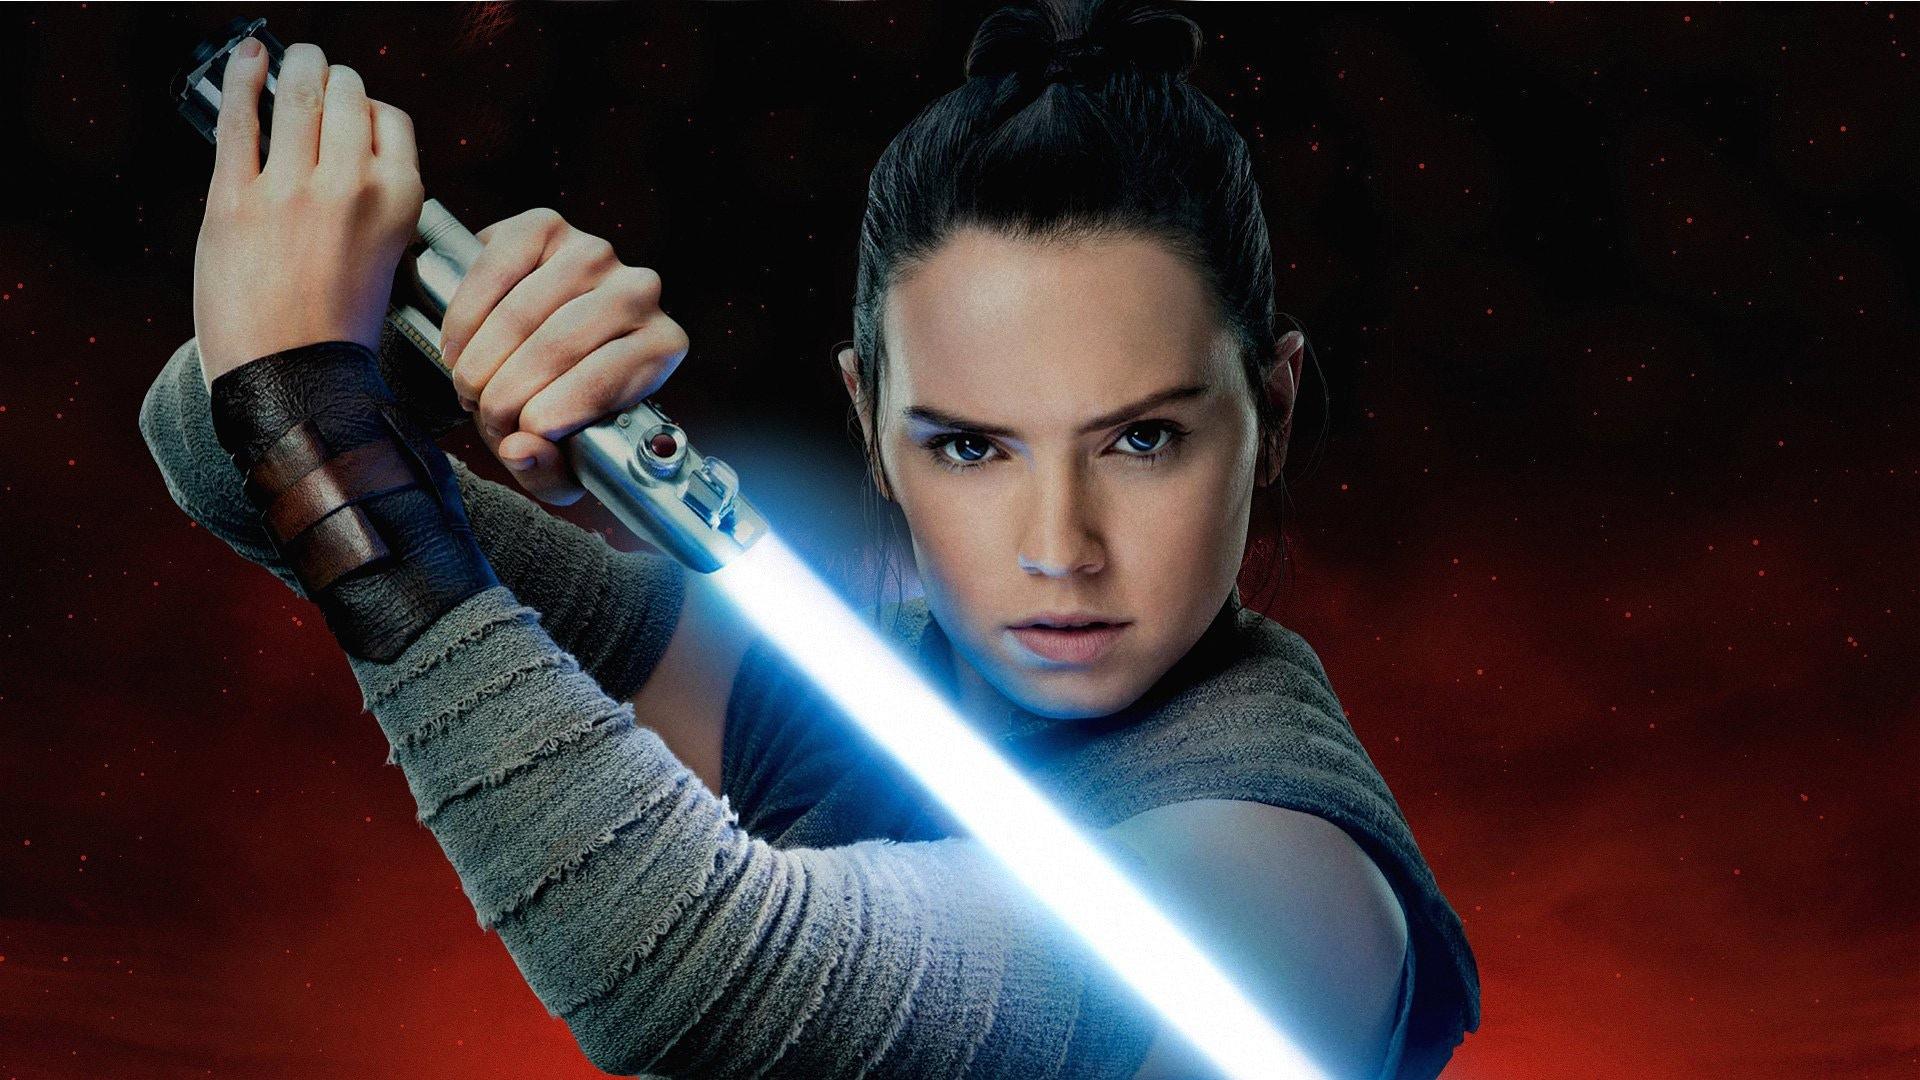 Free Download Rey Aka Daisy Ridley In Star Wars The Last Jedi Full